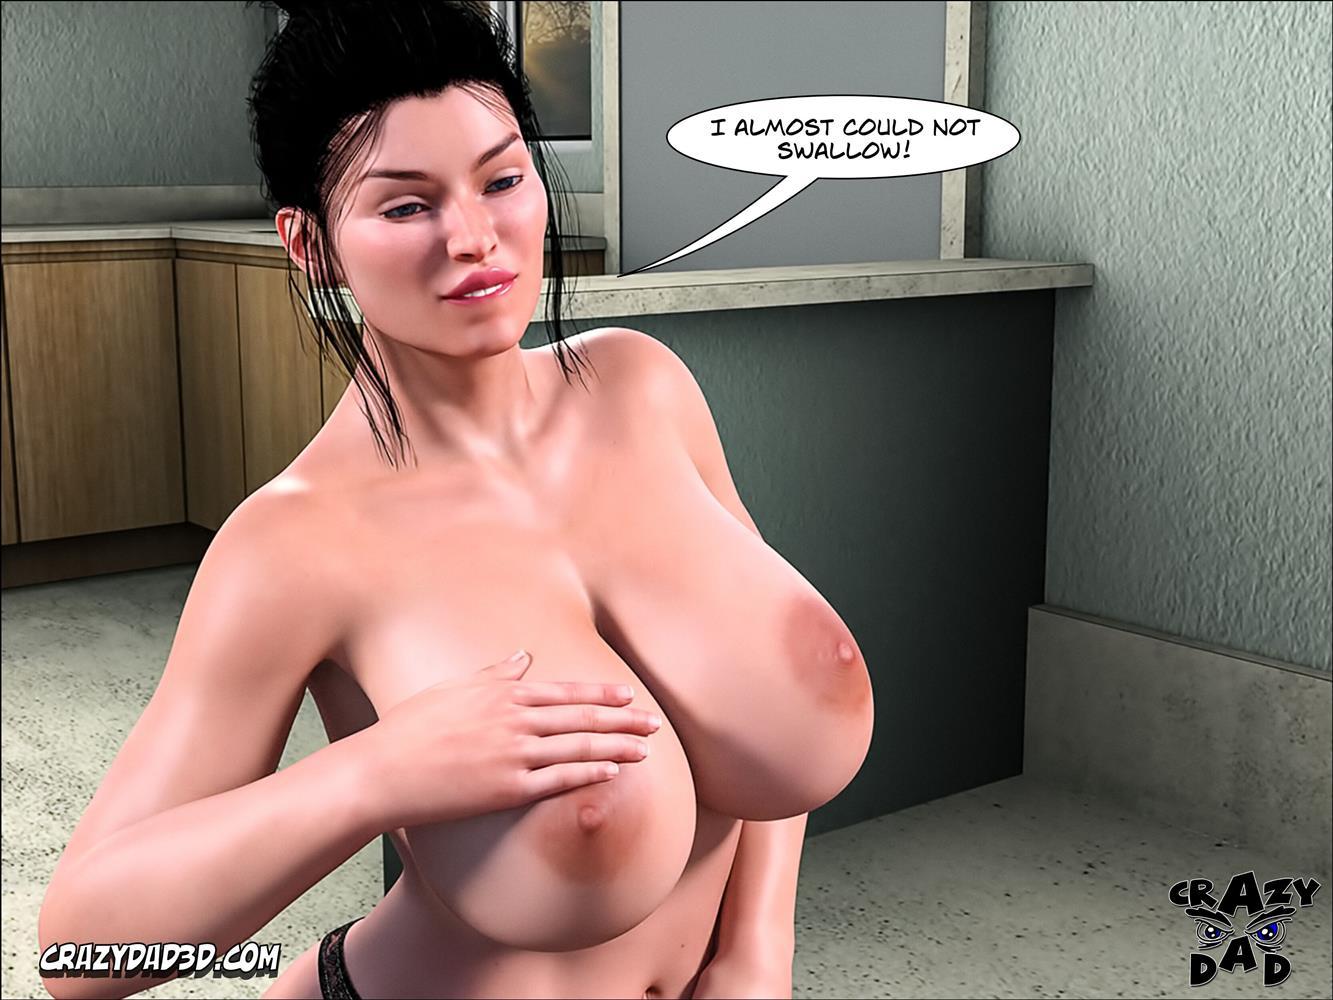 Mom's Help 15 [Crazy Dad 3D] - Foto 4